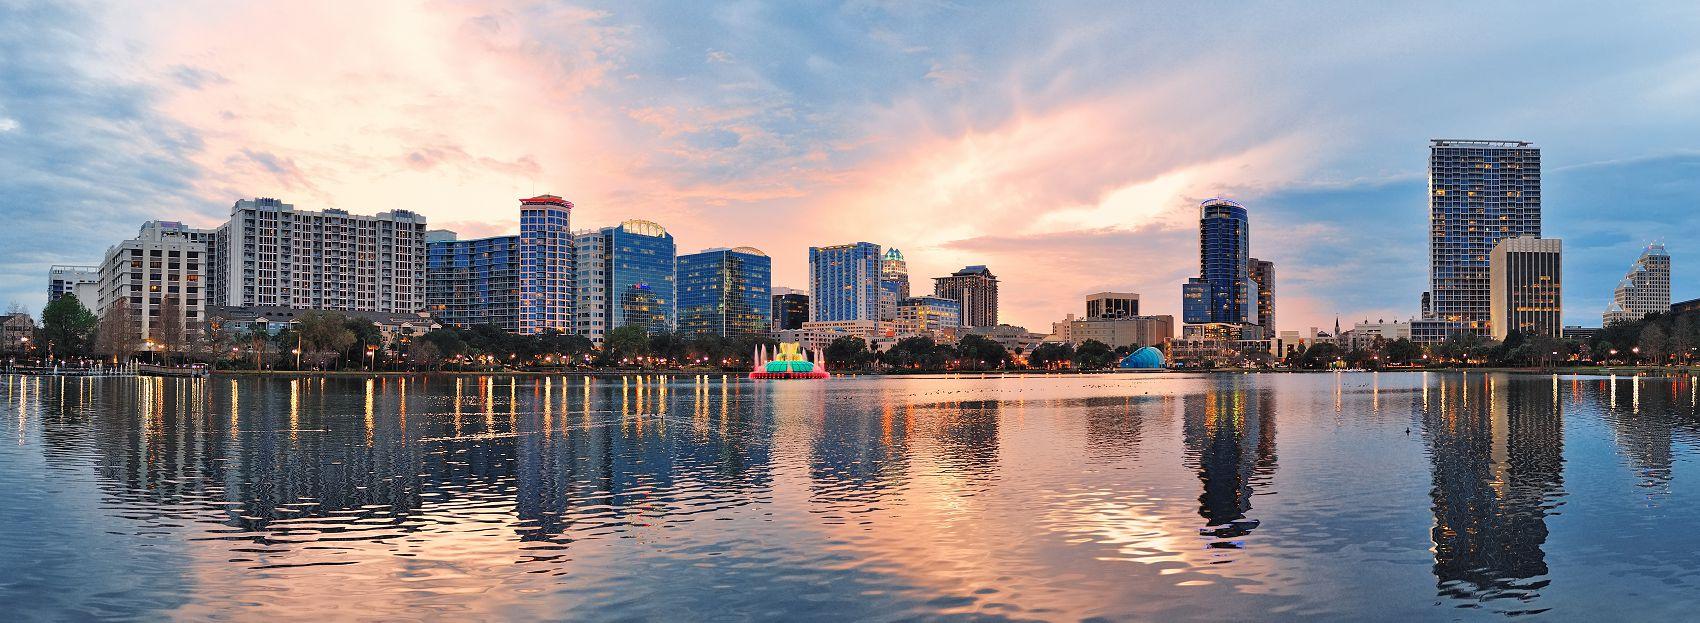 Флорида на закате